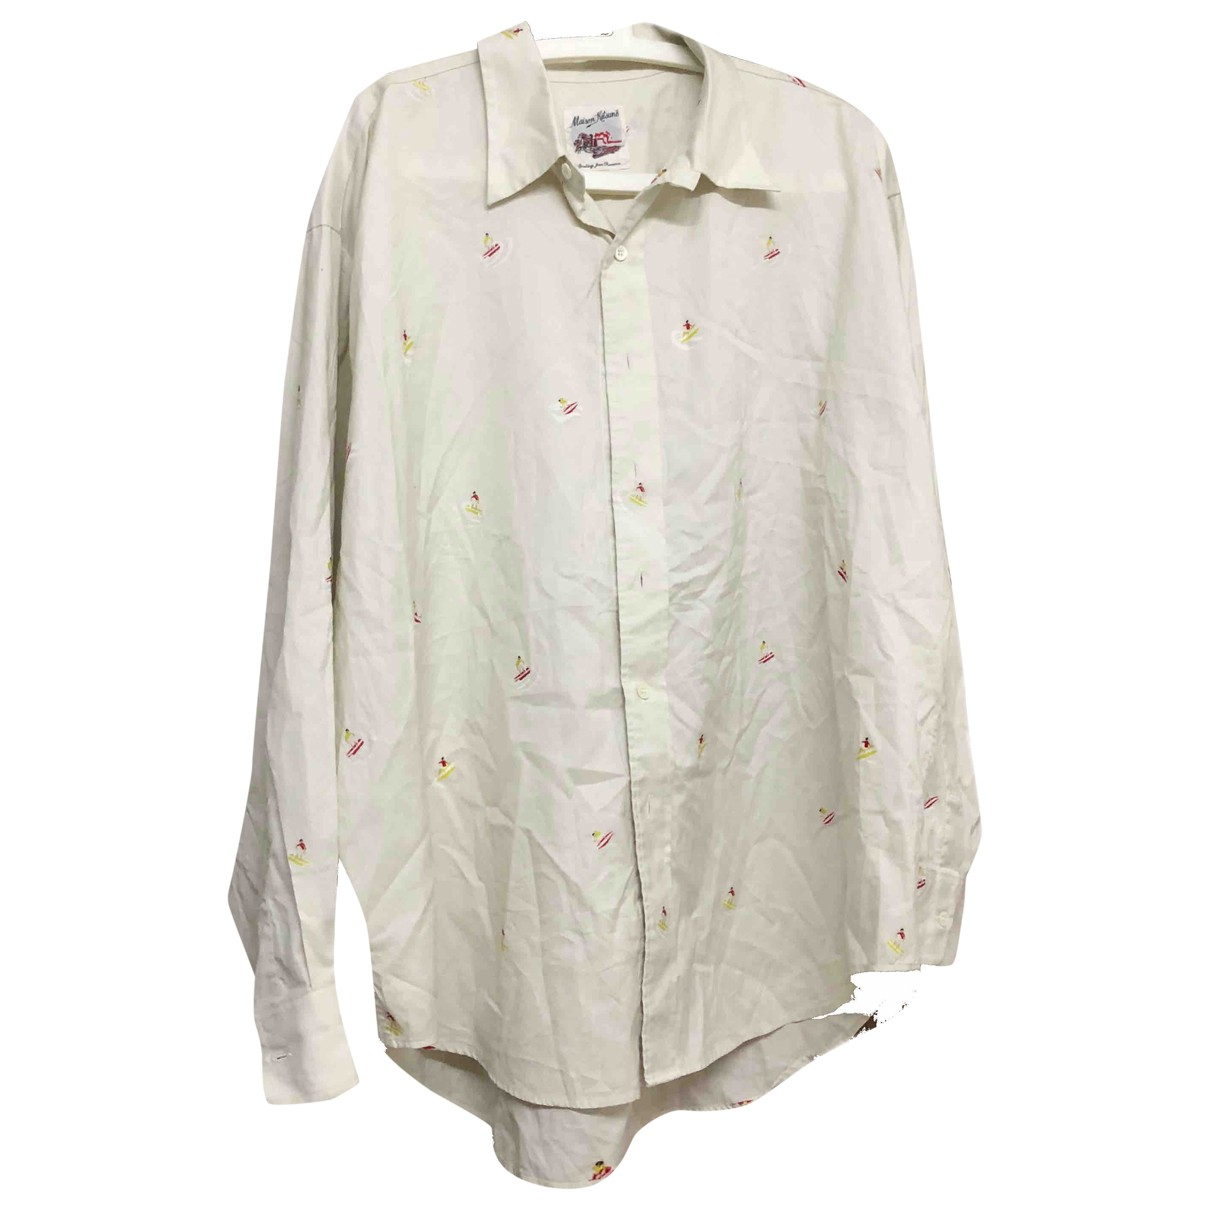 Maison Kitsune \N White Cotton Shirts for Men 42 EU (tour de cou / collar)